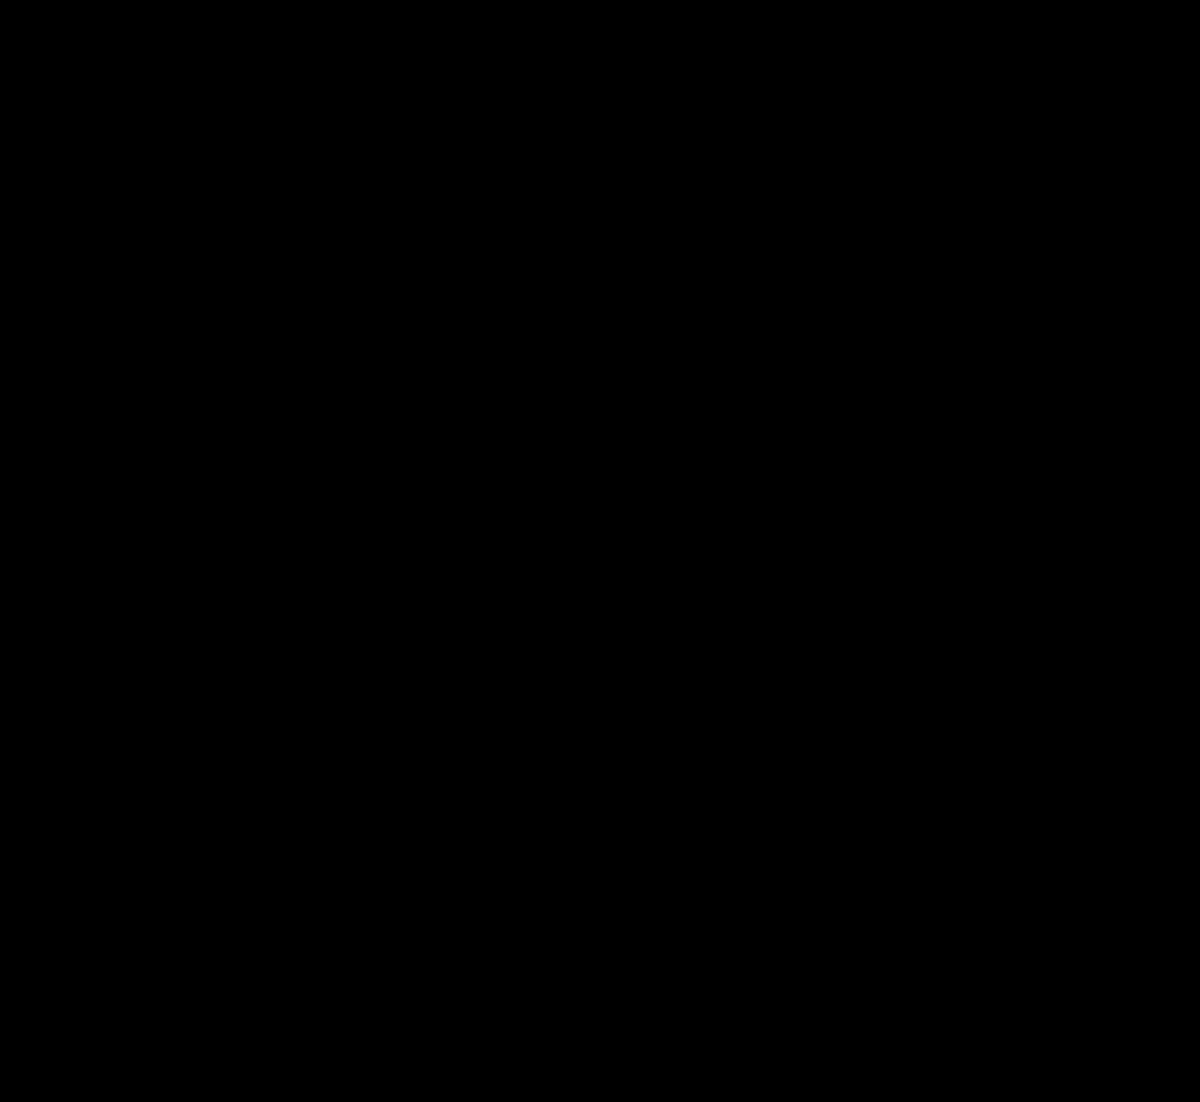 Partychimp – Fopartikel – Borrelwormen